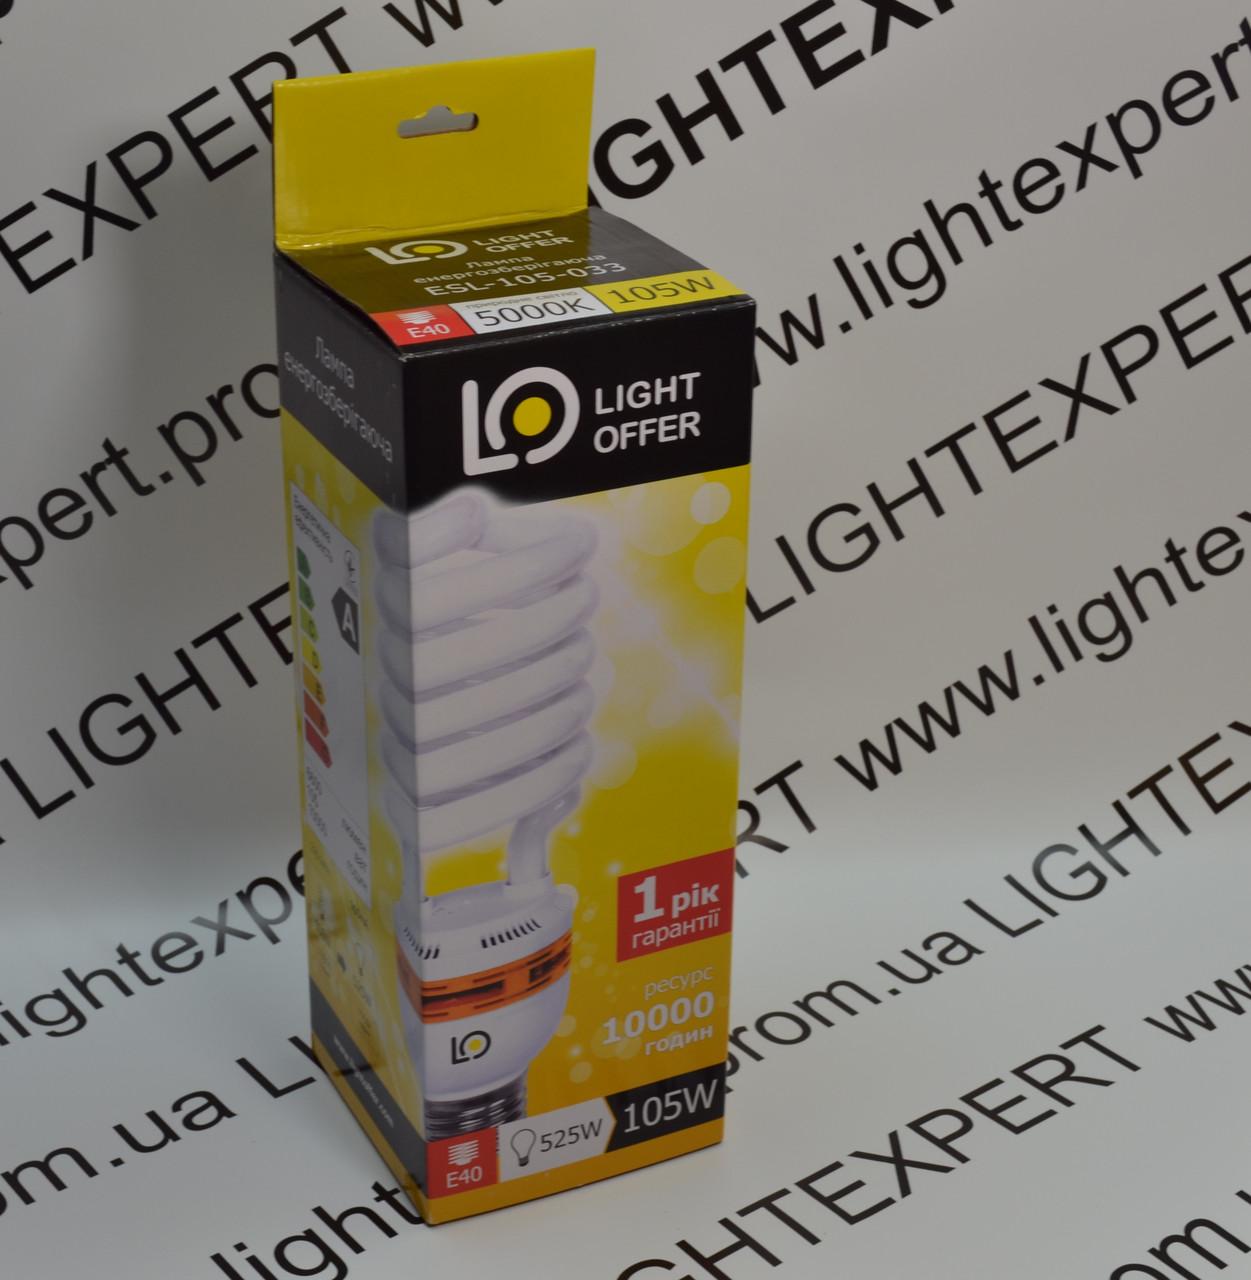 Энергосберегающая лампа LightOffer 105W E40 5000K